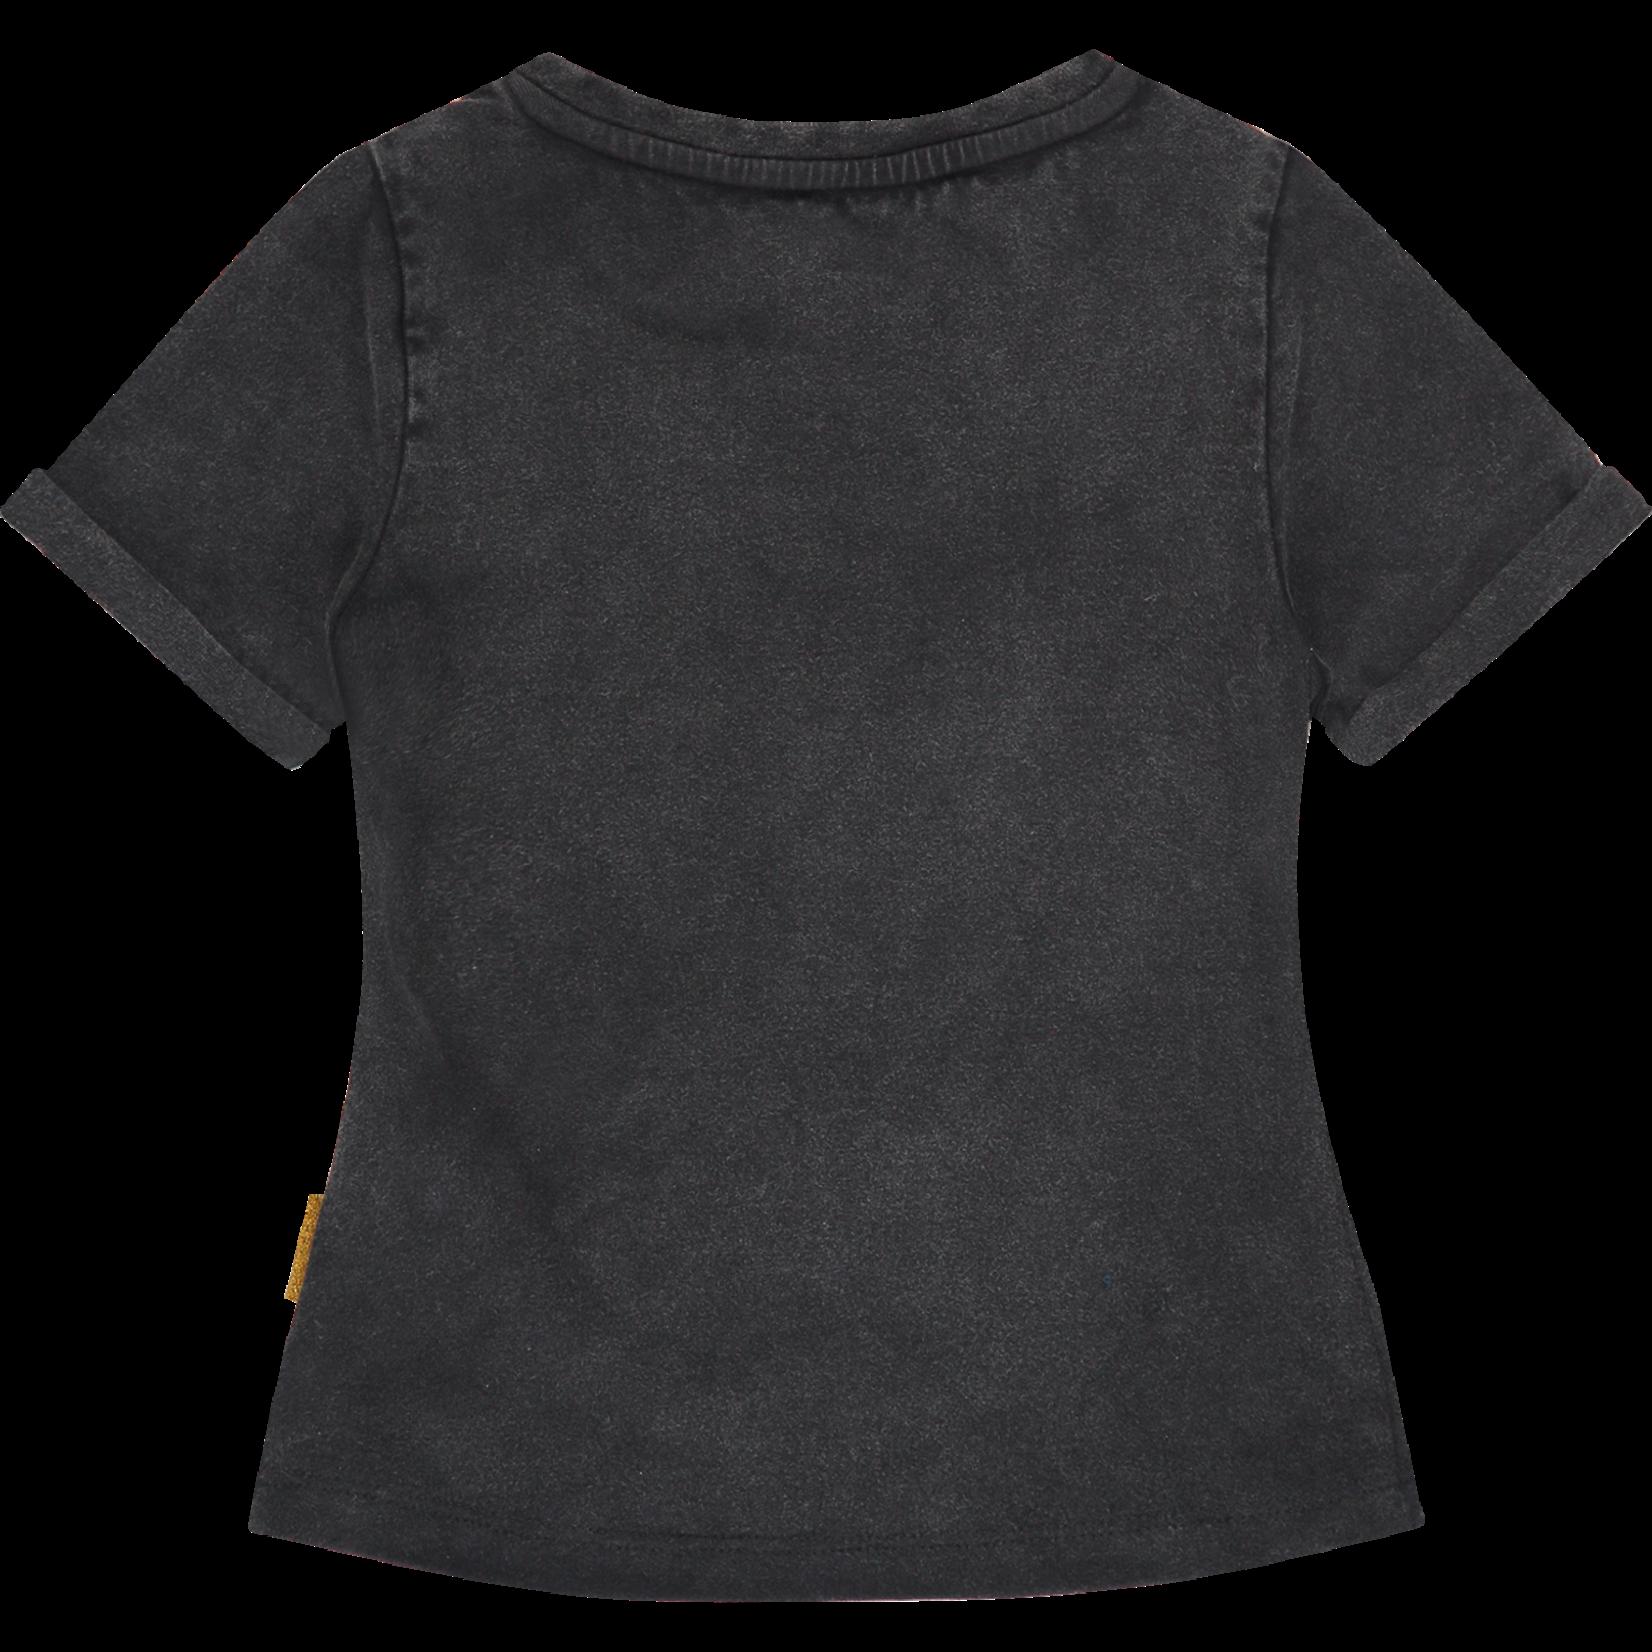 Vingino T-shirt Hille Deep Black